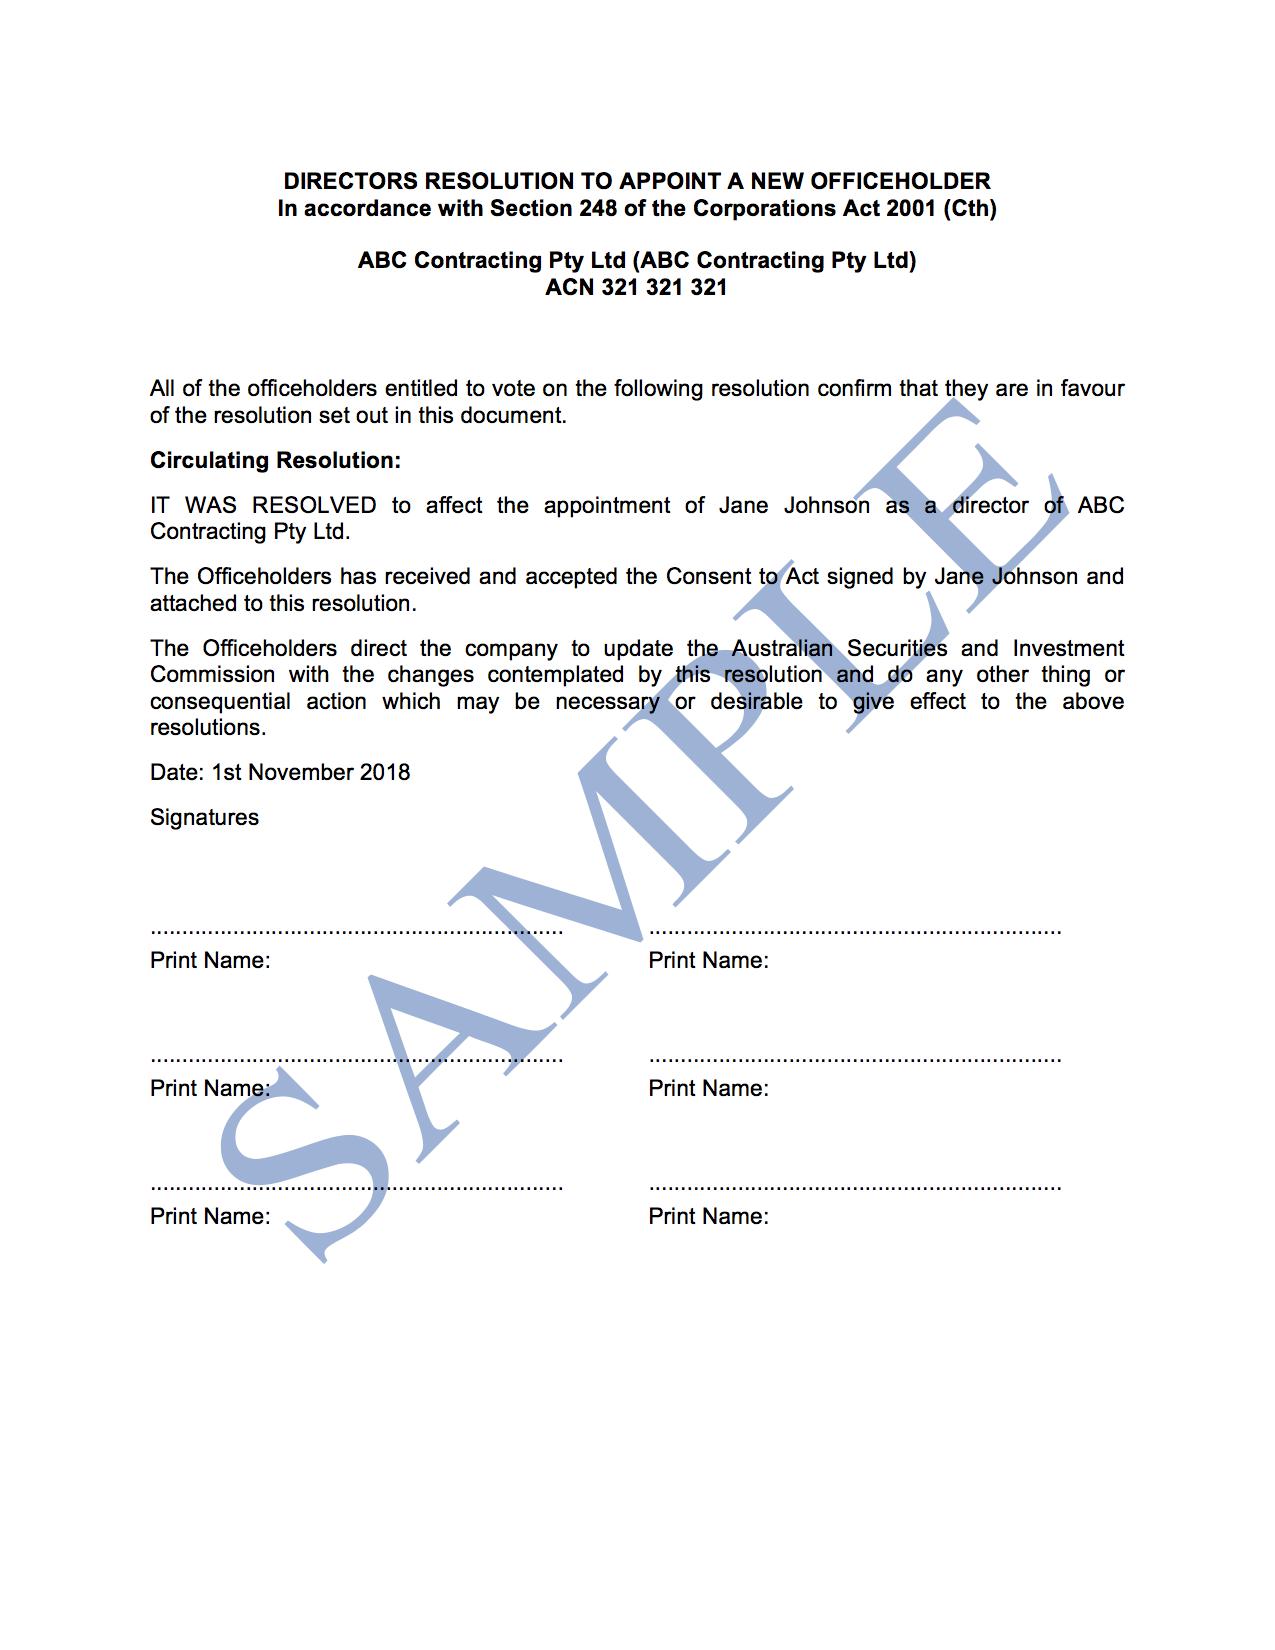 Directors Resolution (General)